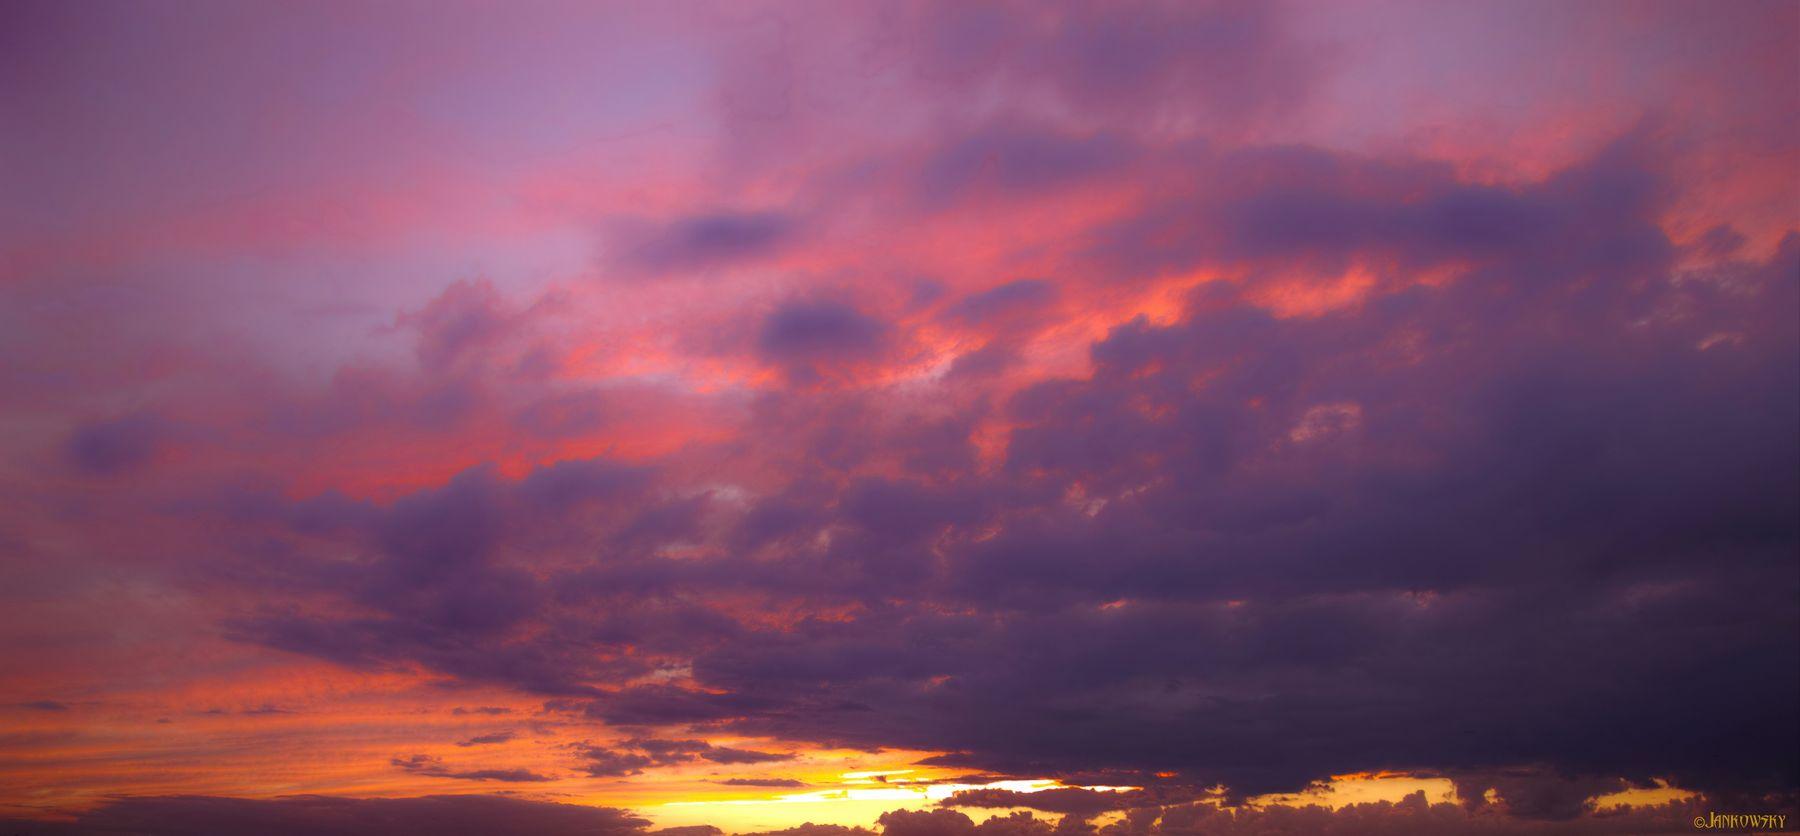 Foveon-безумия омского неба до отвисания челюсти Sigma SD1 Merrill Foveon панорама облаков закат омск розовый оранжевый